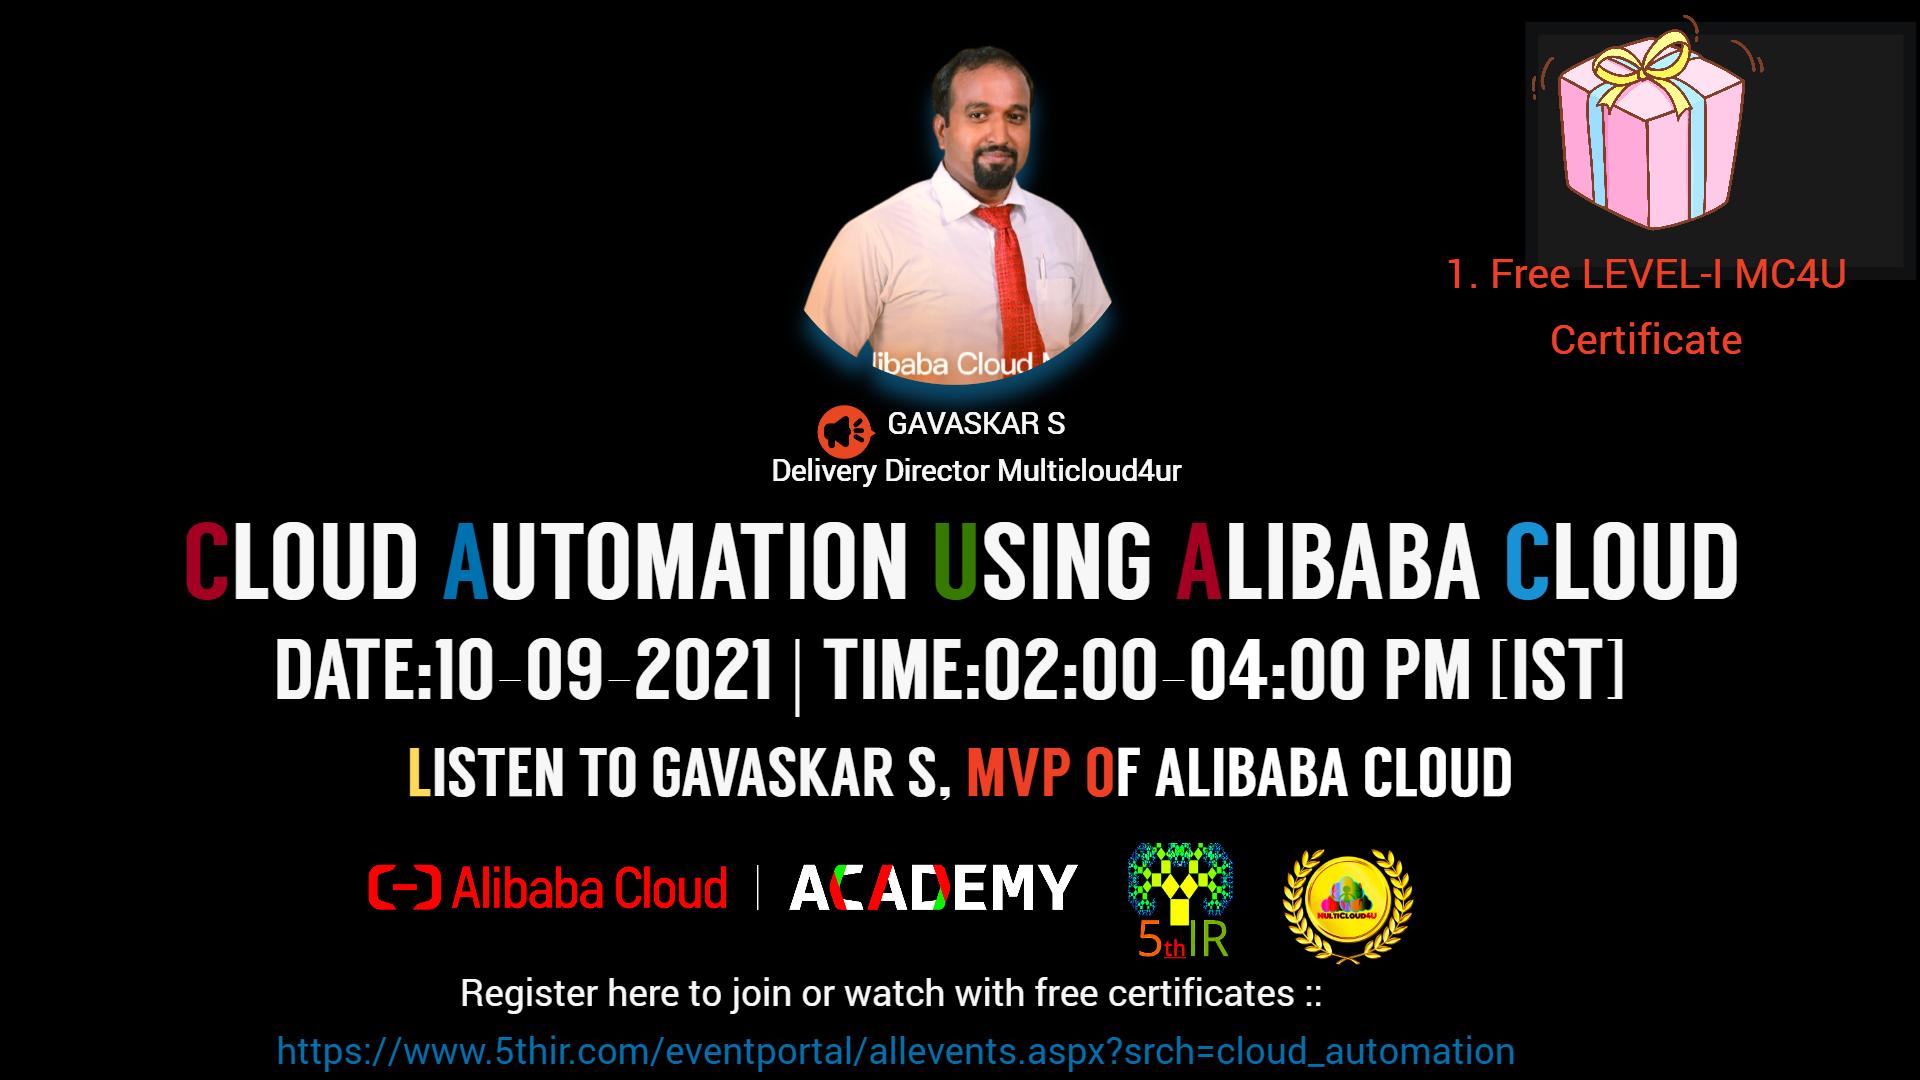 Cloud Automation using Alibaba Cloud